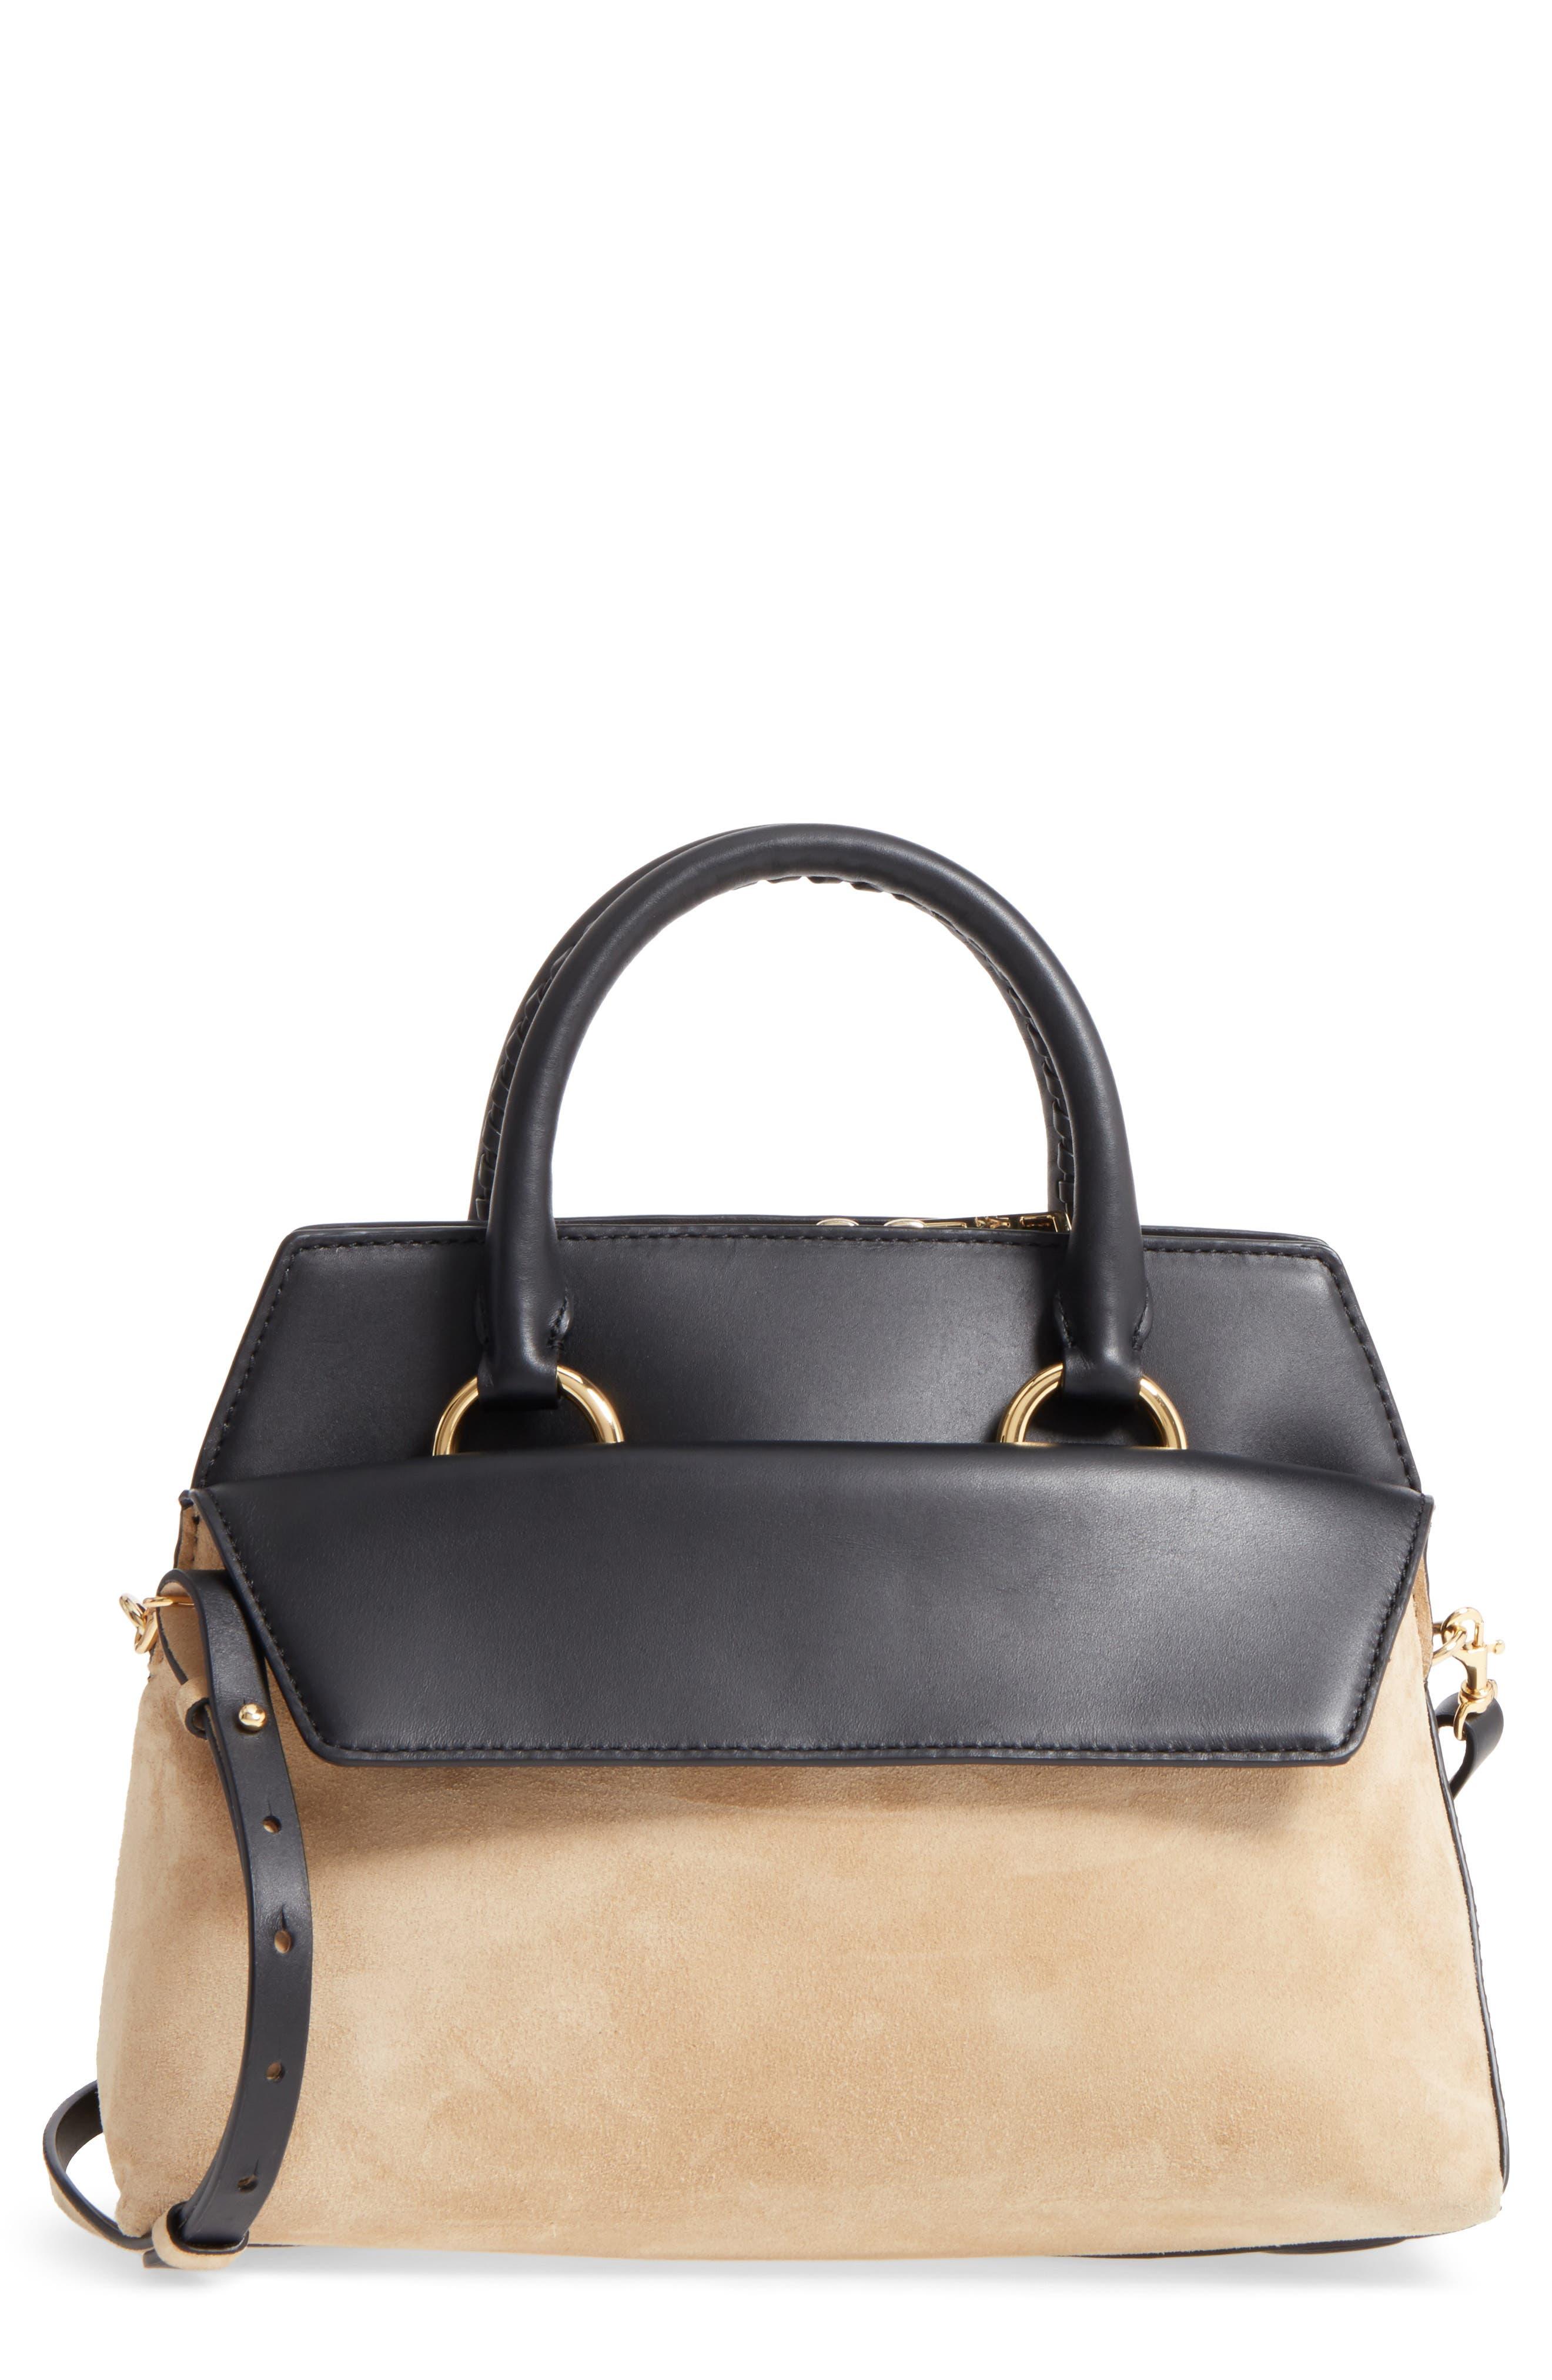 Alternate Image 1 Selected - Diane von Furstenberg Small Leather & Suede Satchel